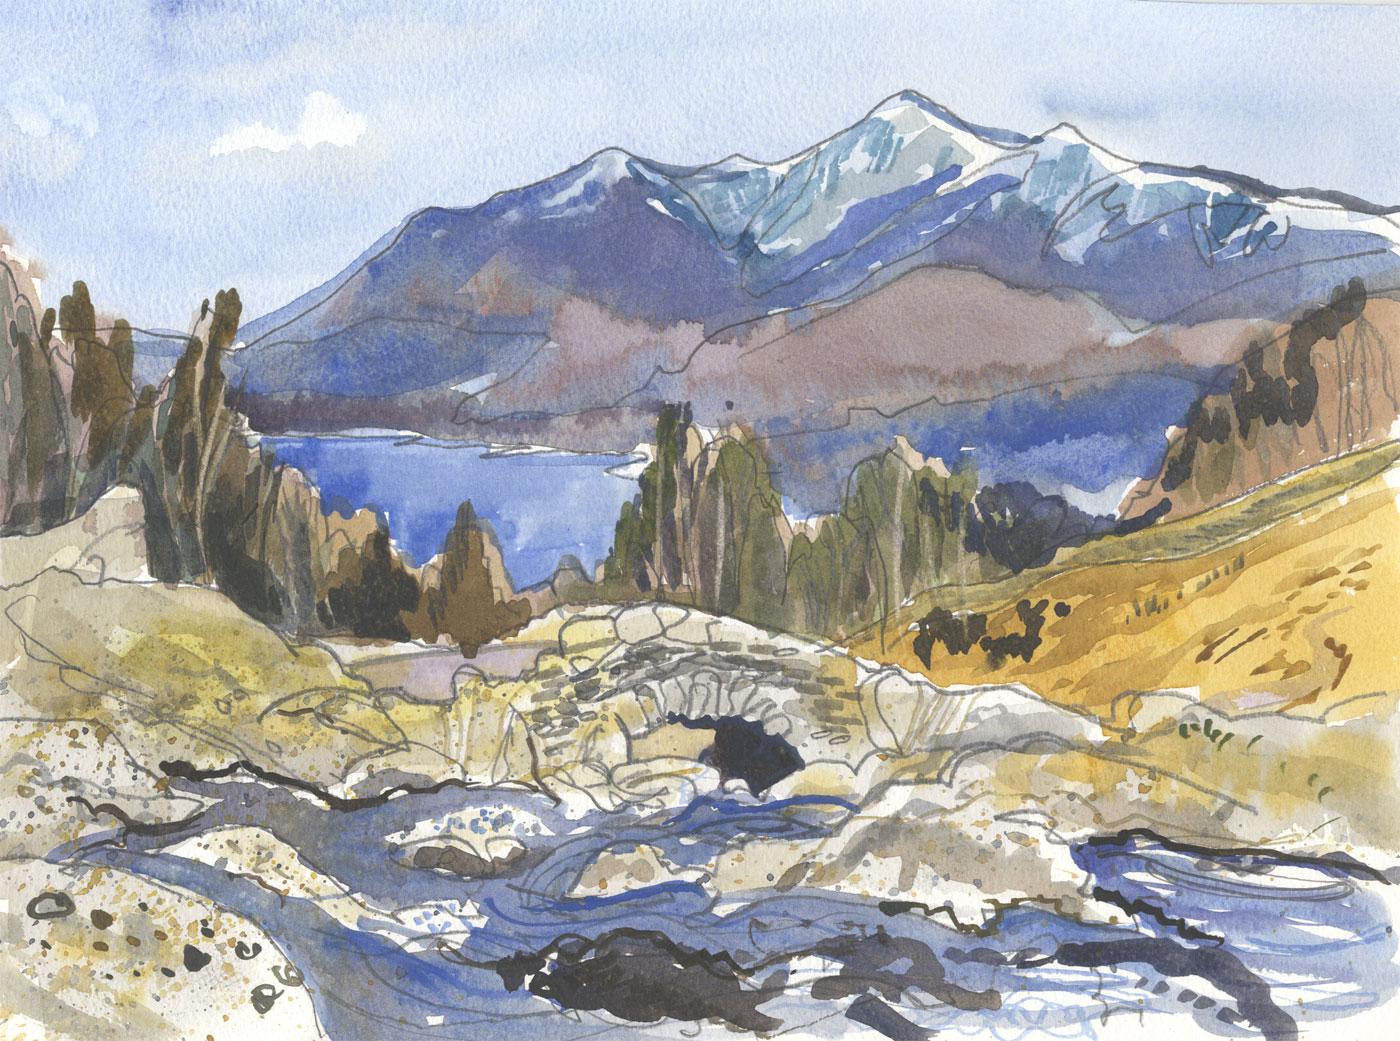 Robert T. Blayney (1929-2016) - Mid 20th Century Watercolour, Mountain View